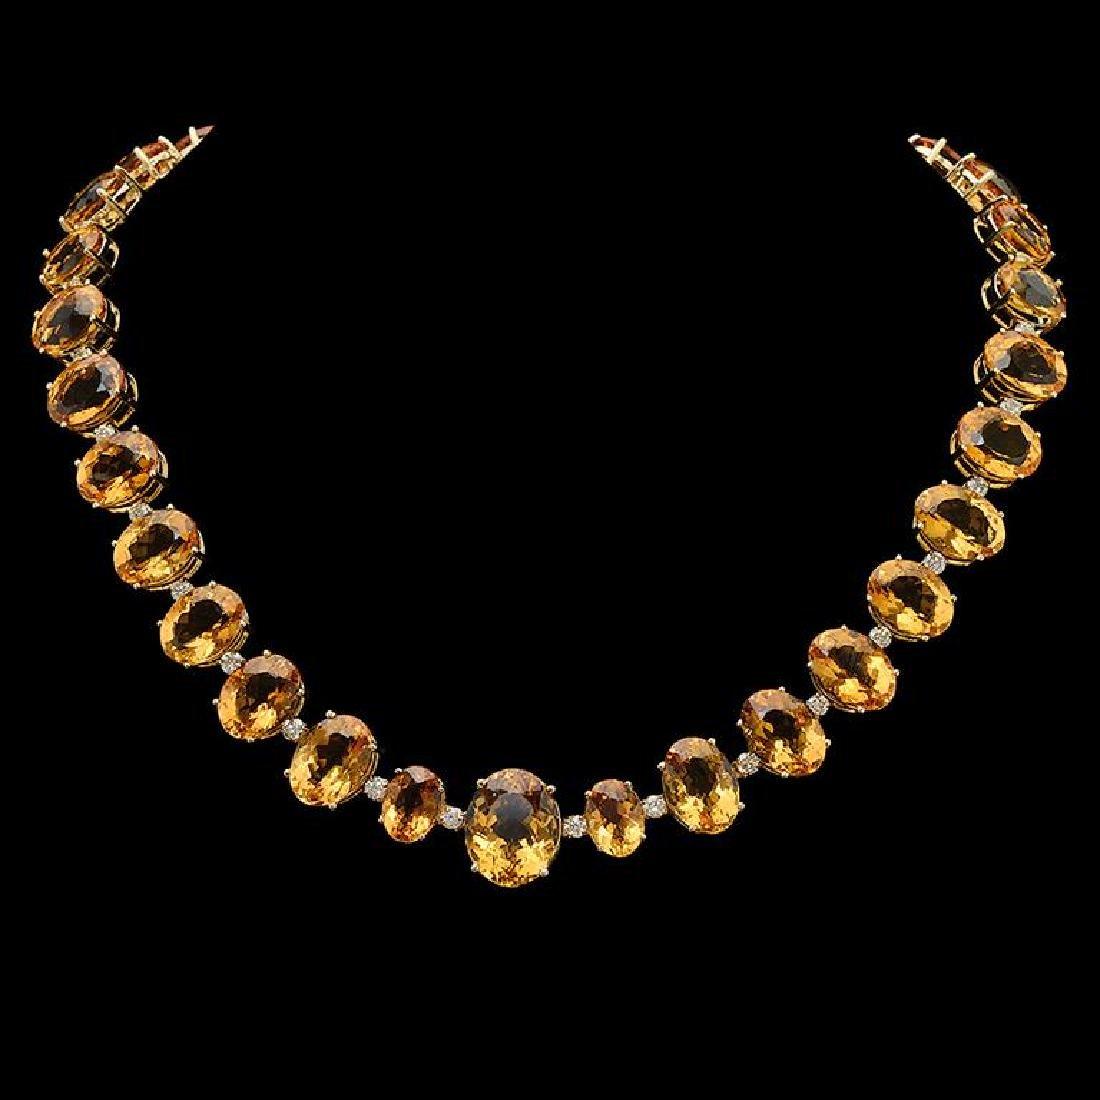 14K Gold 152.53ct Citrine & 4.10ct Diamond Necklace